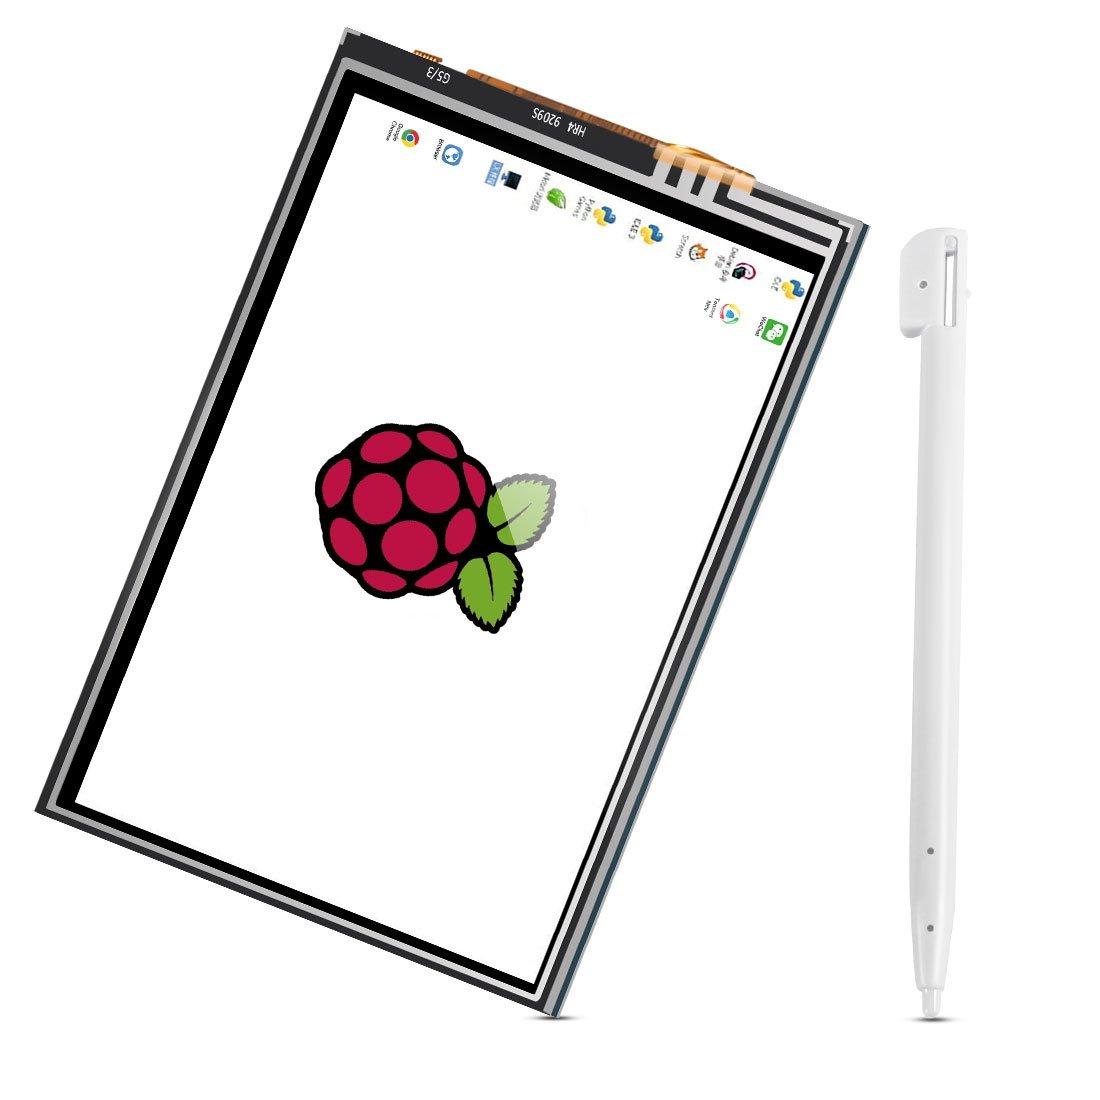 Dorhea Raspberry Pi 3 Model B TFT LCD Display Kit,3.5 inch 480x320 TFT Touch Screen Moudle with Protective Case Cooling Fan and Heatsinks for Raspberry Pi 3 B+,Pi 3 B, Pi 2, Pi Zero, Pi B+ by Dorhea (Image #2)